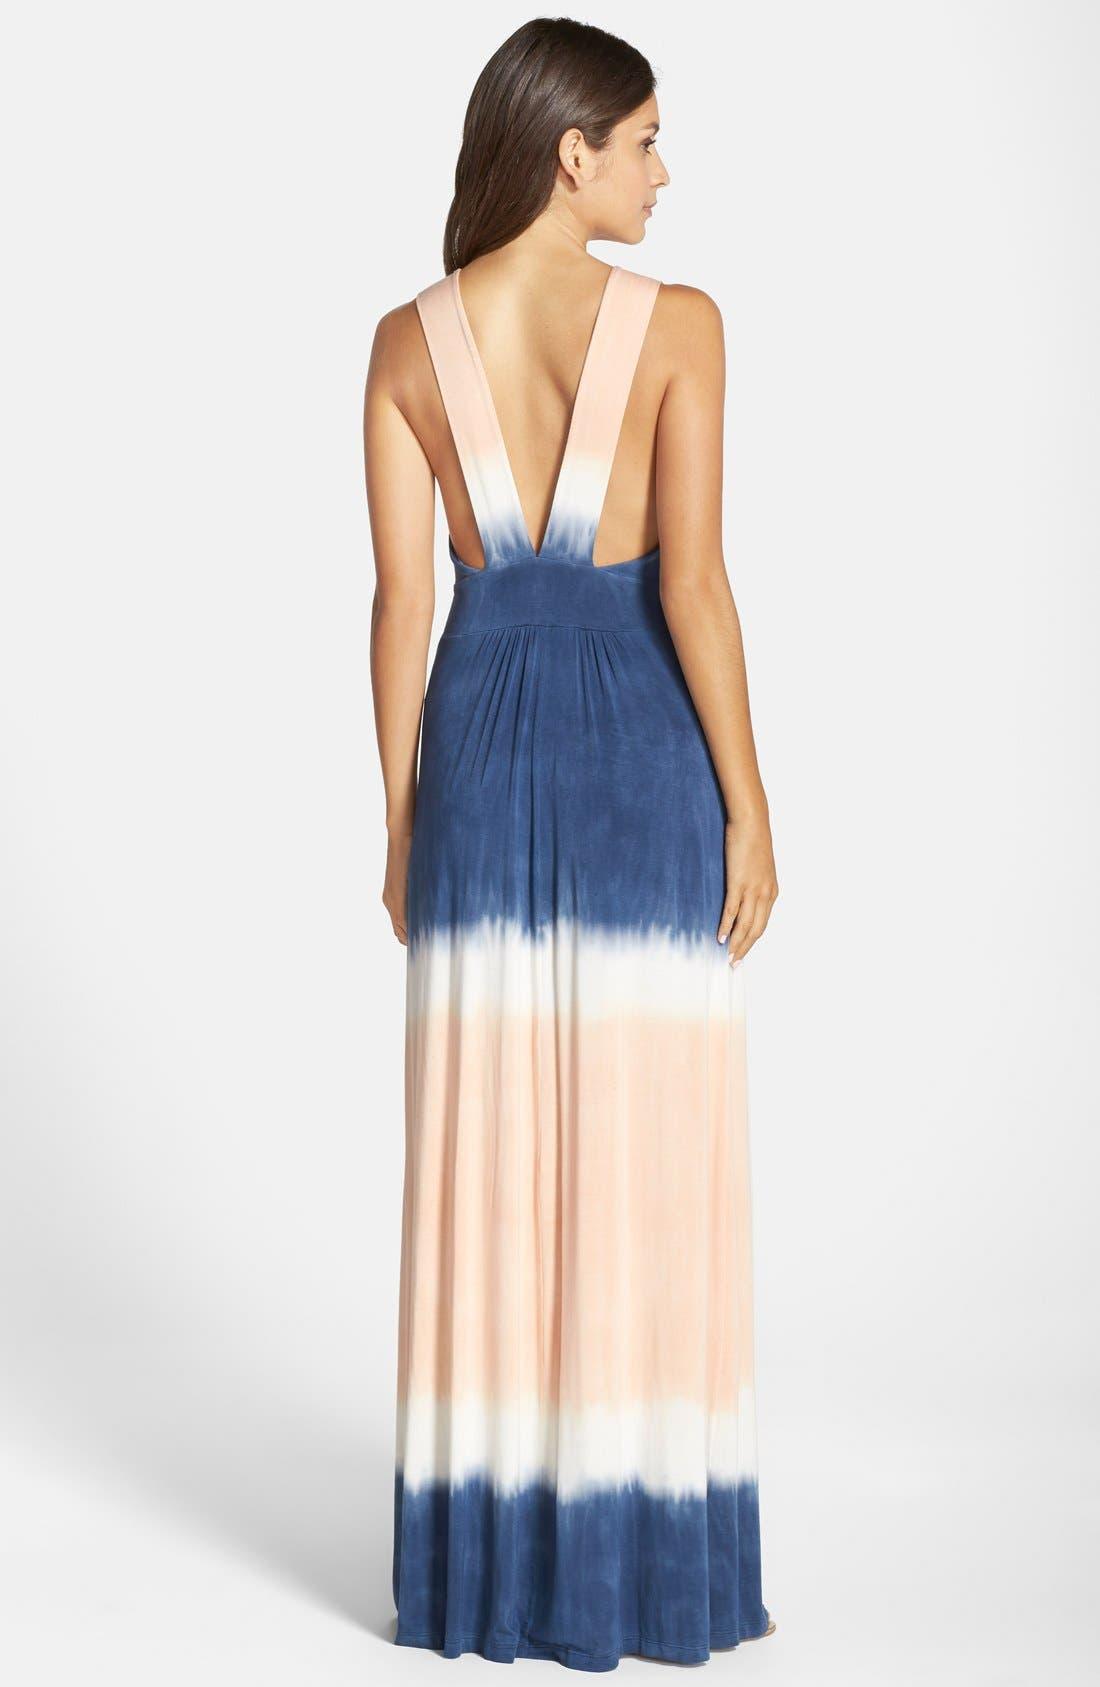 Tie Dye Sleeveless Maxi Dress,                             Alternate thumbnail 8, color,                             400